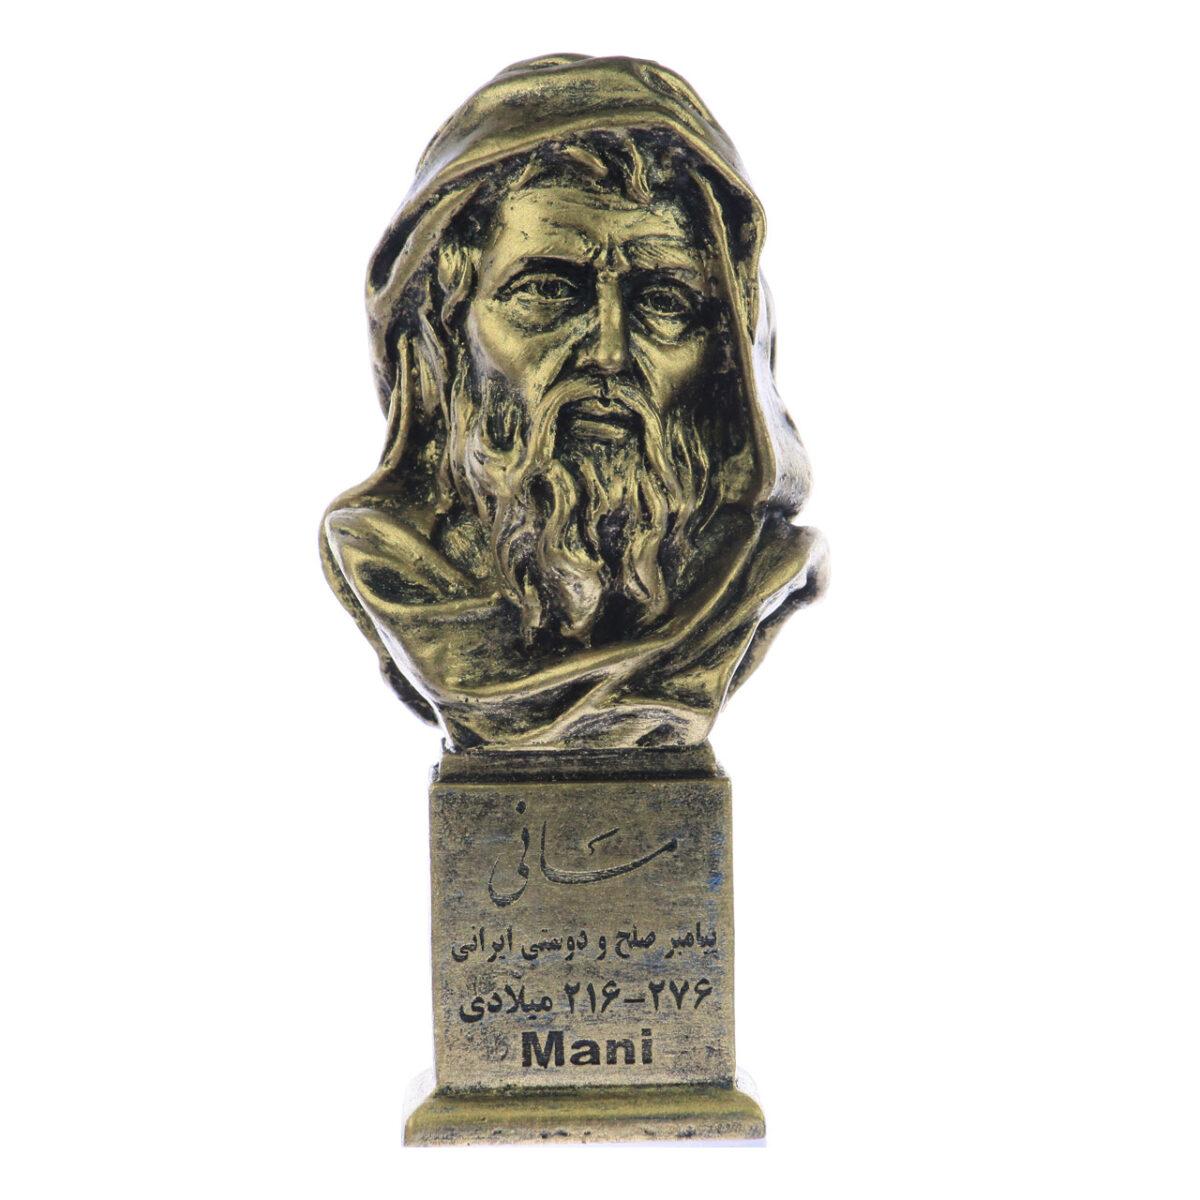 mani b 1200x1200 - سردیس مانی پیامبر